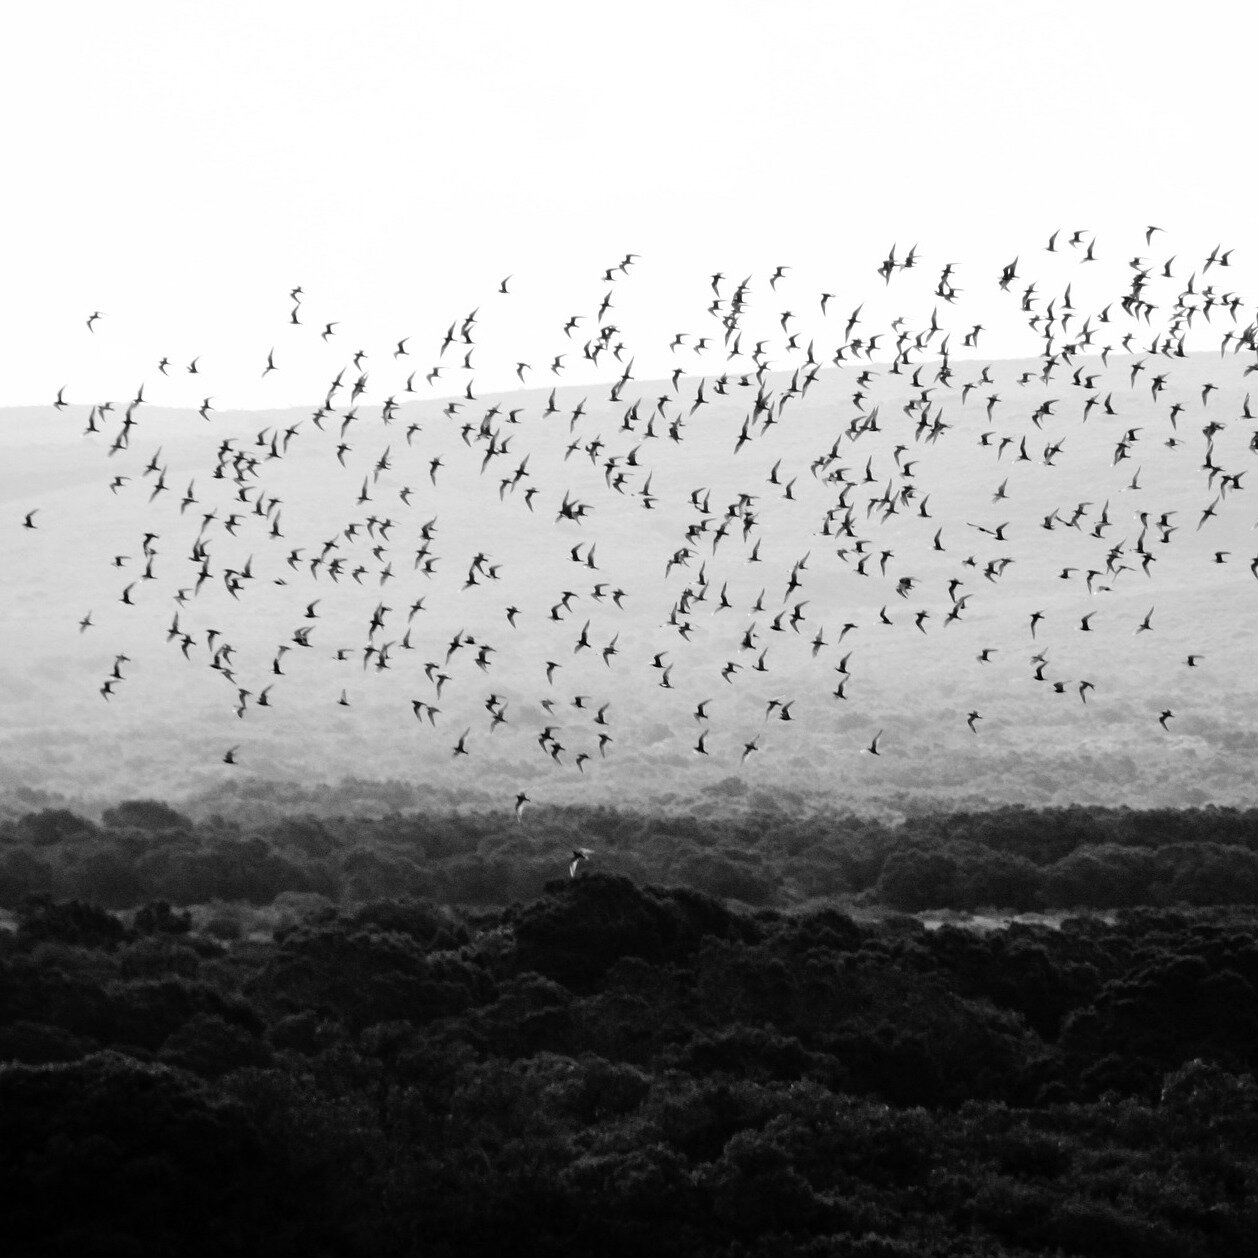 bird-290744_1920.jpg